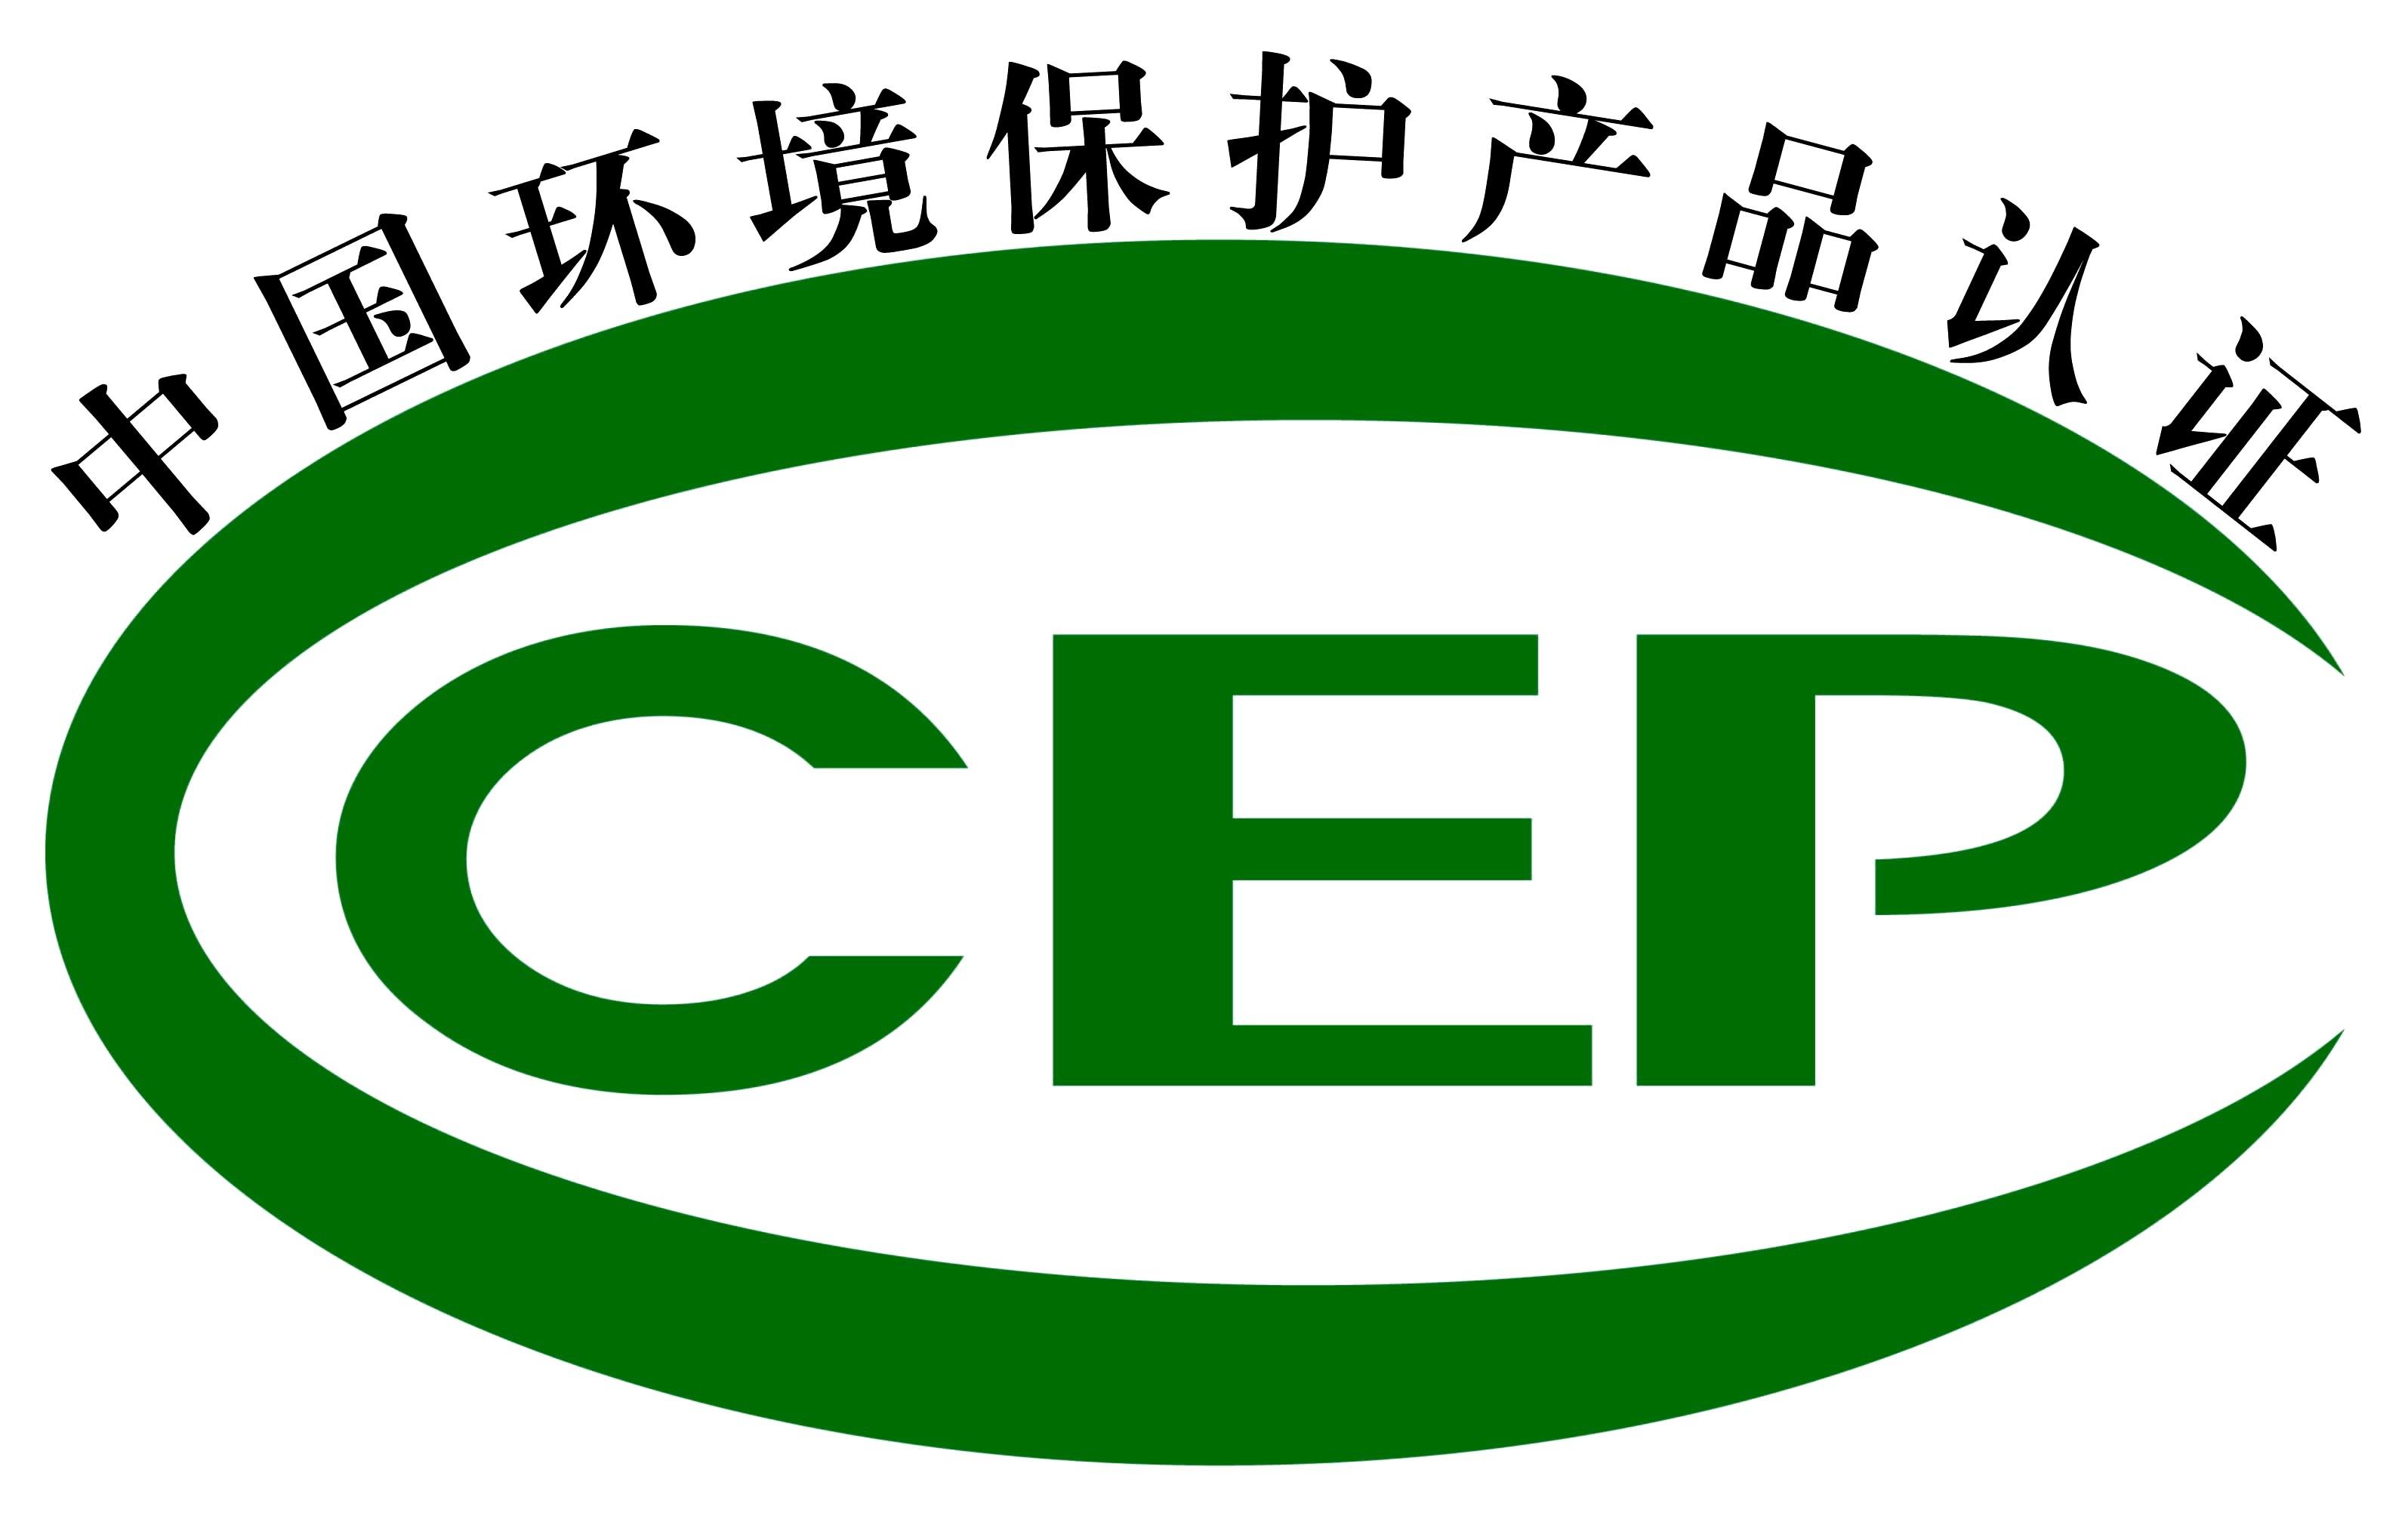 ccep环保产品认证标识